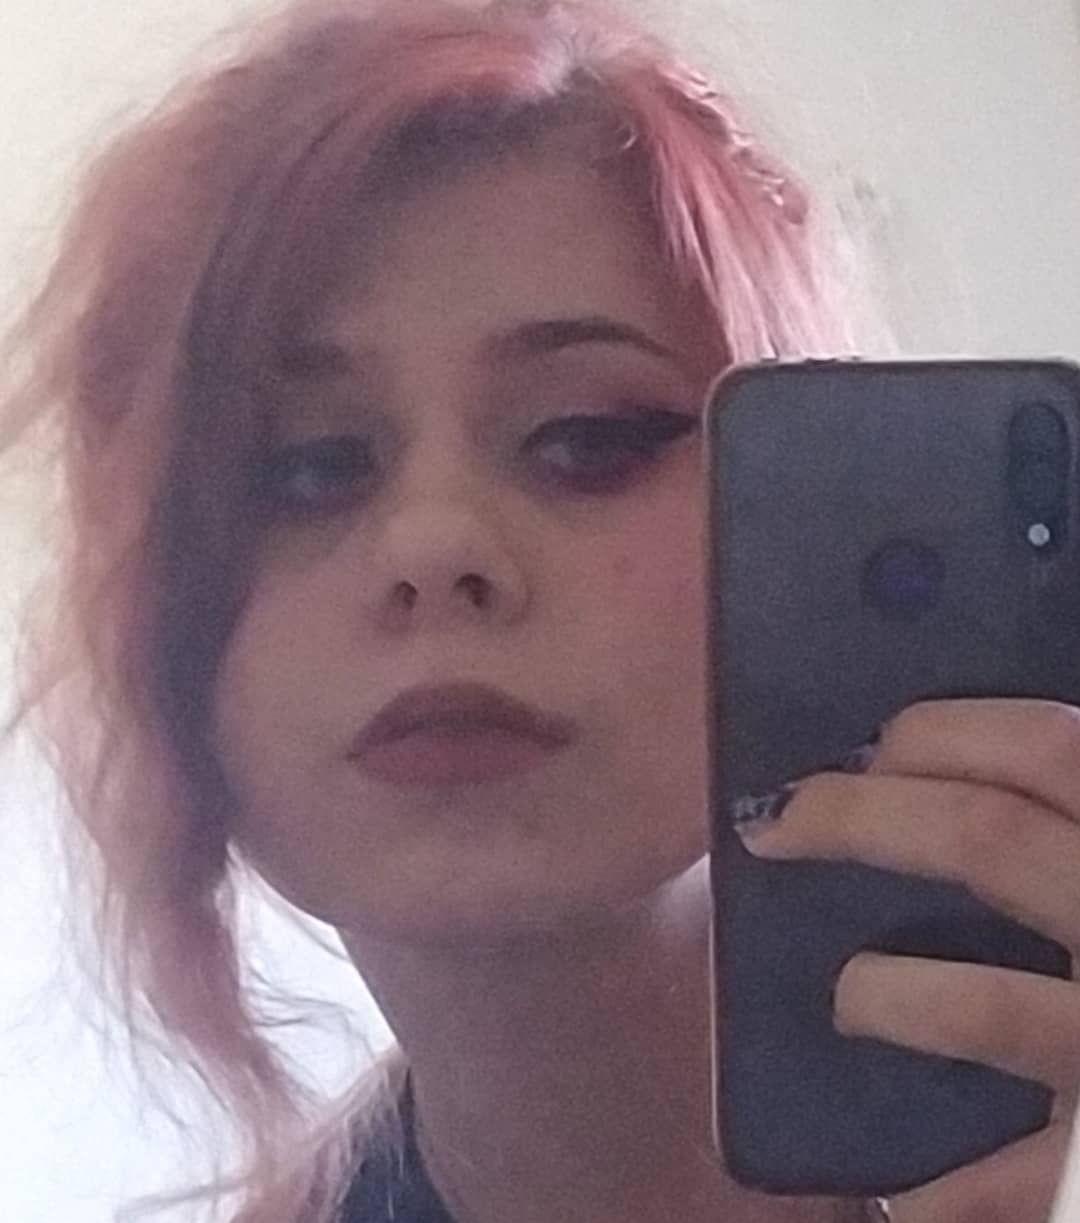 ☘️ . . . . . . . #art #alternativegirl #altgirl #emogirl #makeup #metal #photooftheday #redhead #cute #core #love